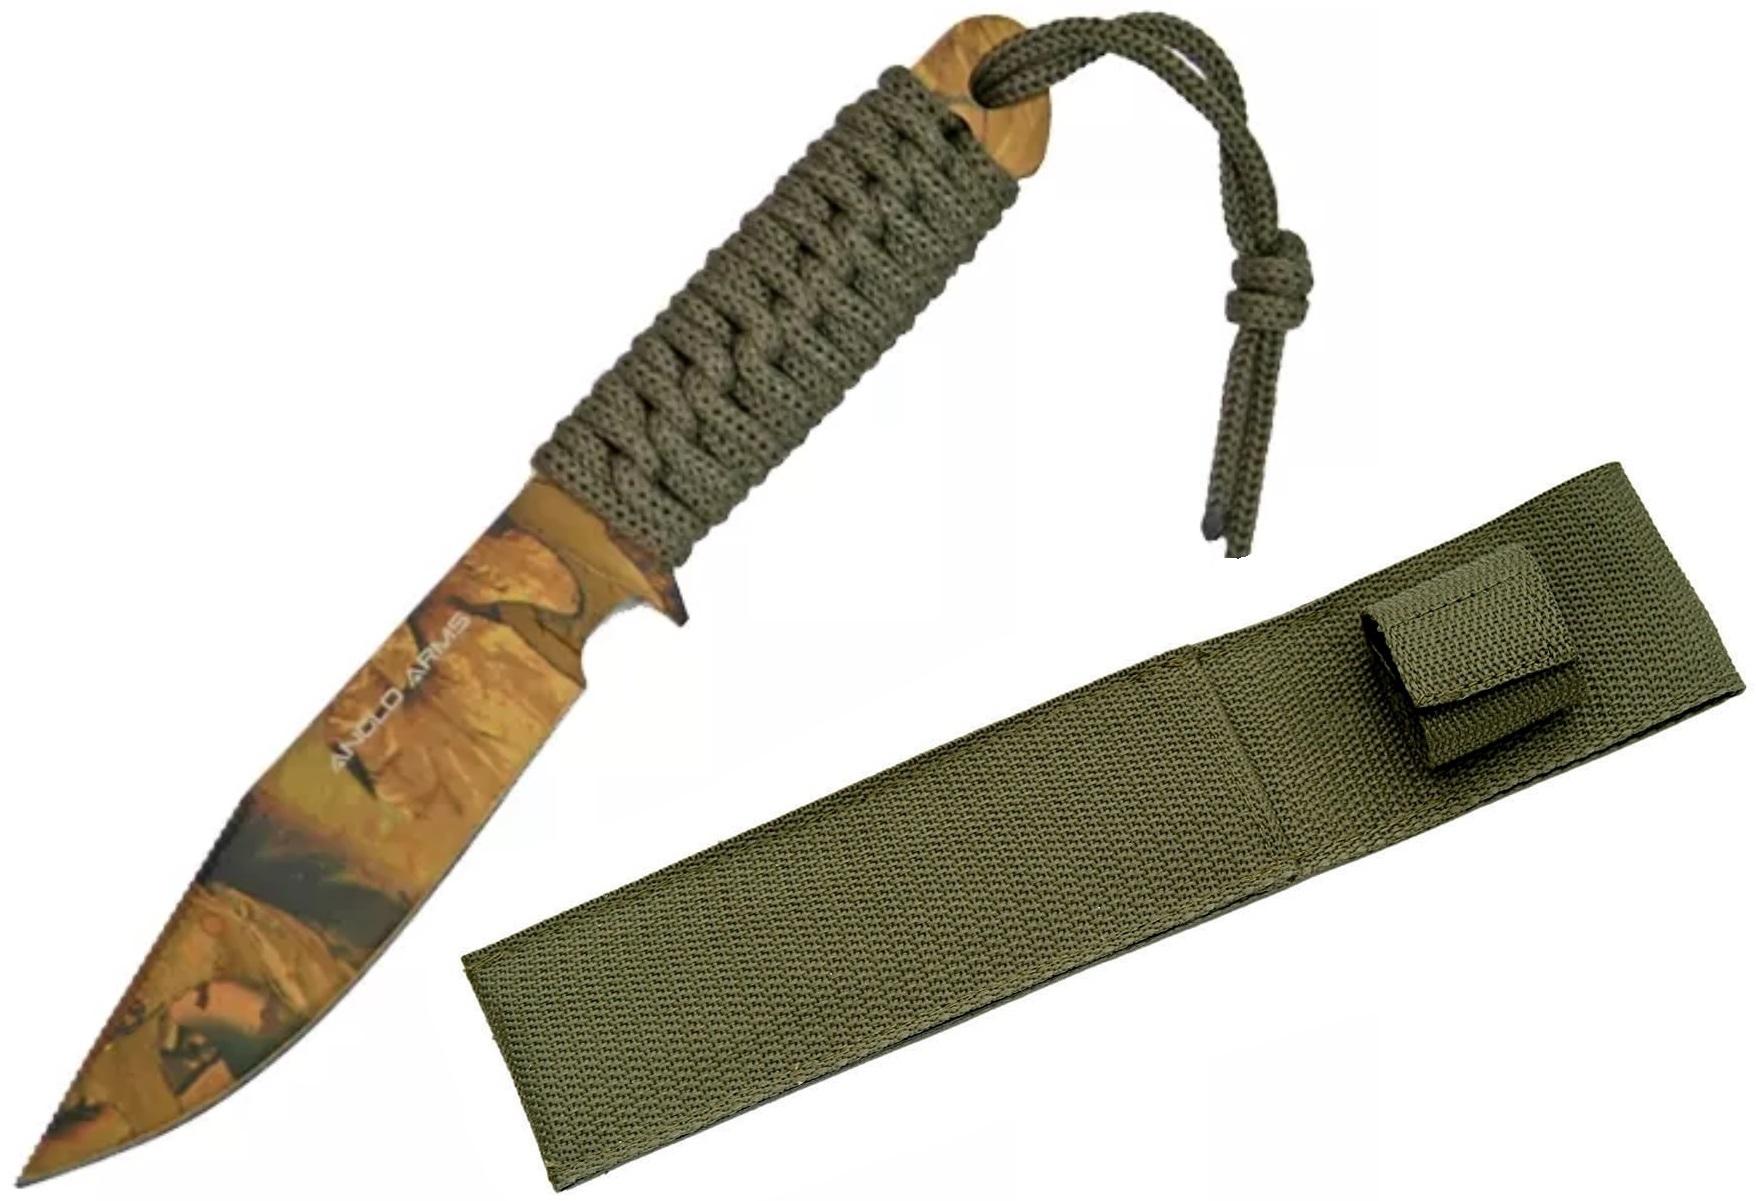 Couteau tactique 19cm full tang - poignard paracorde